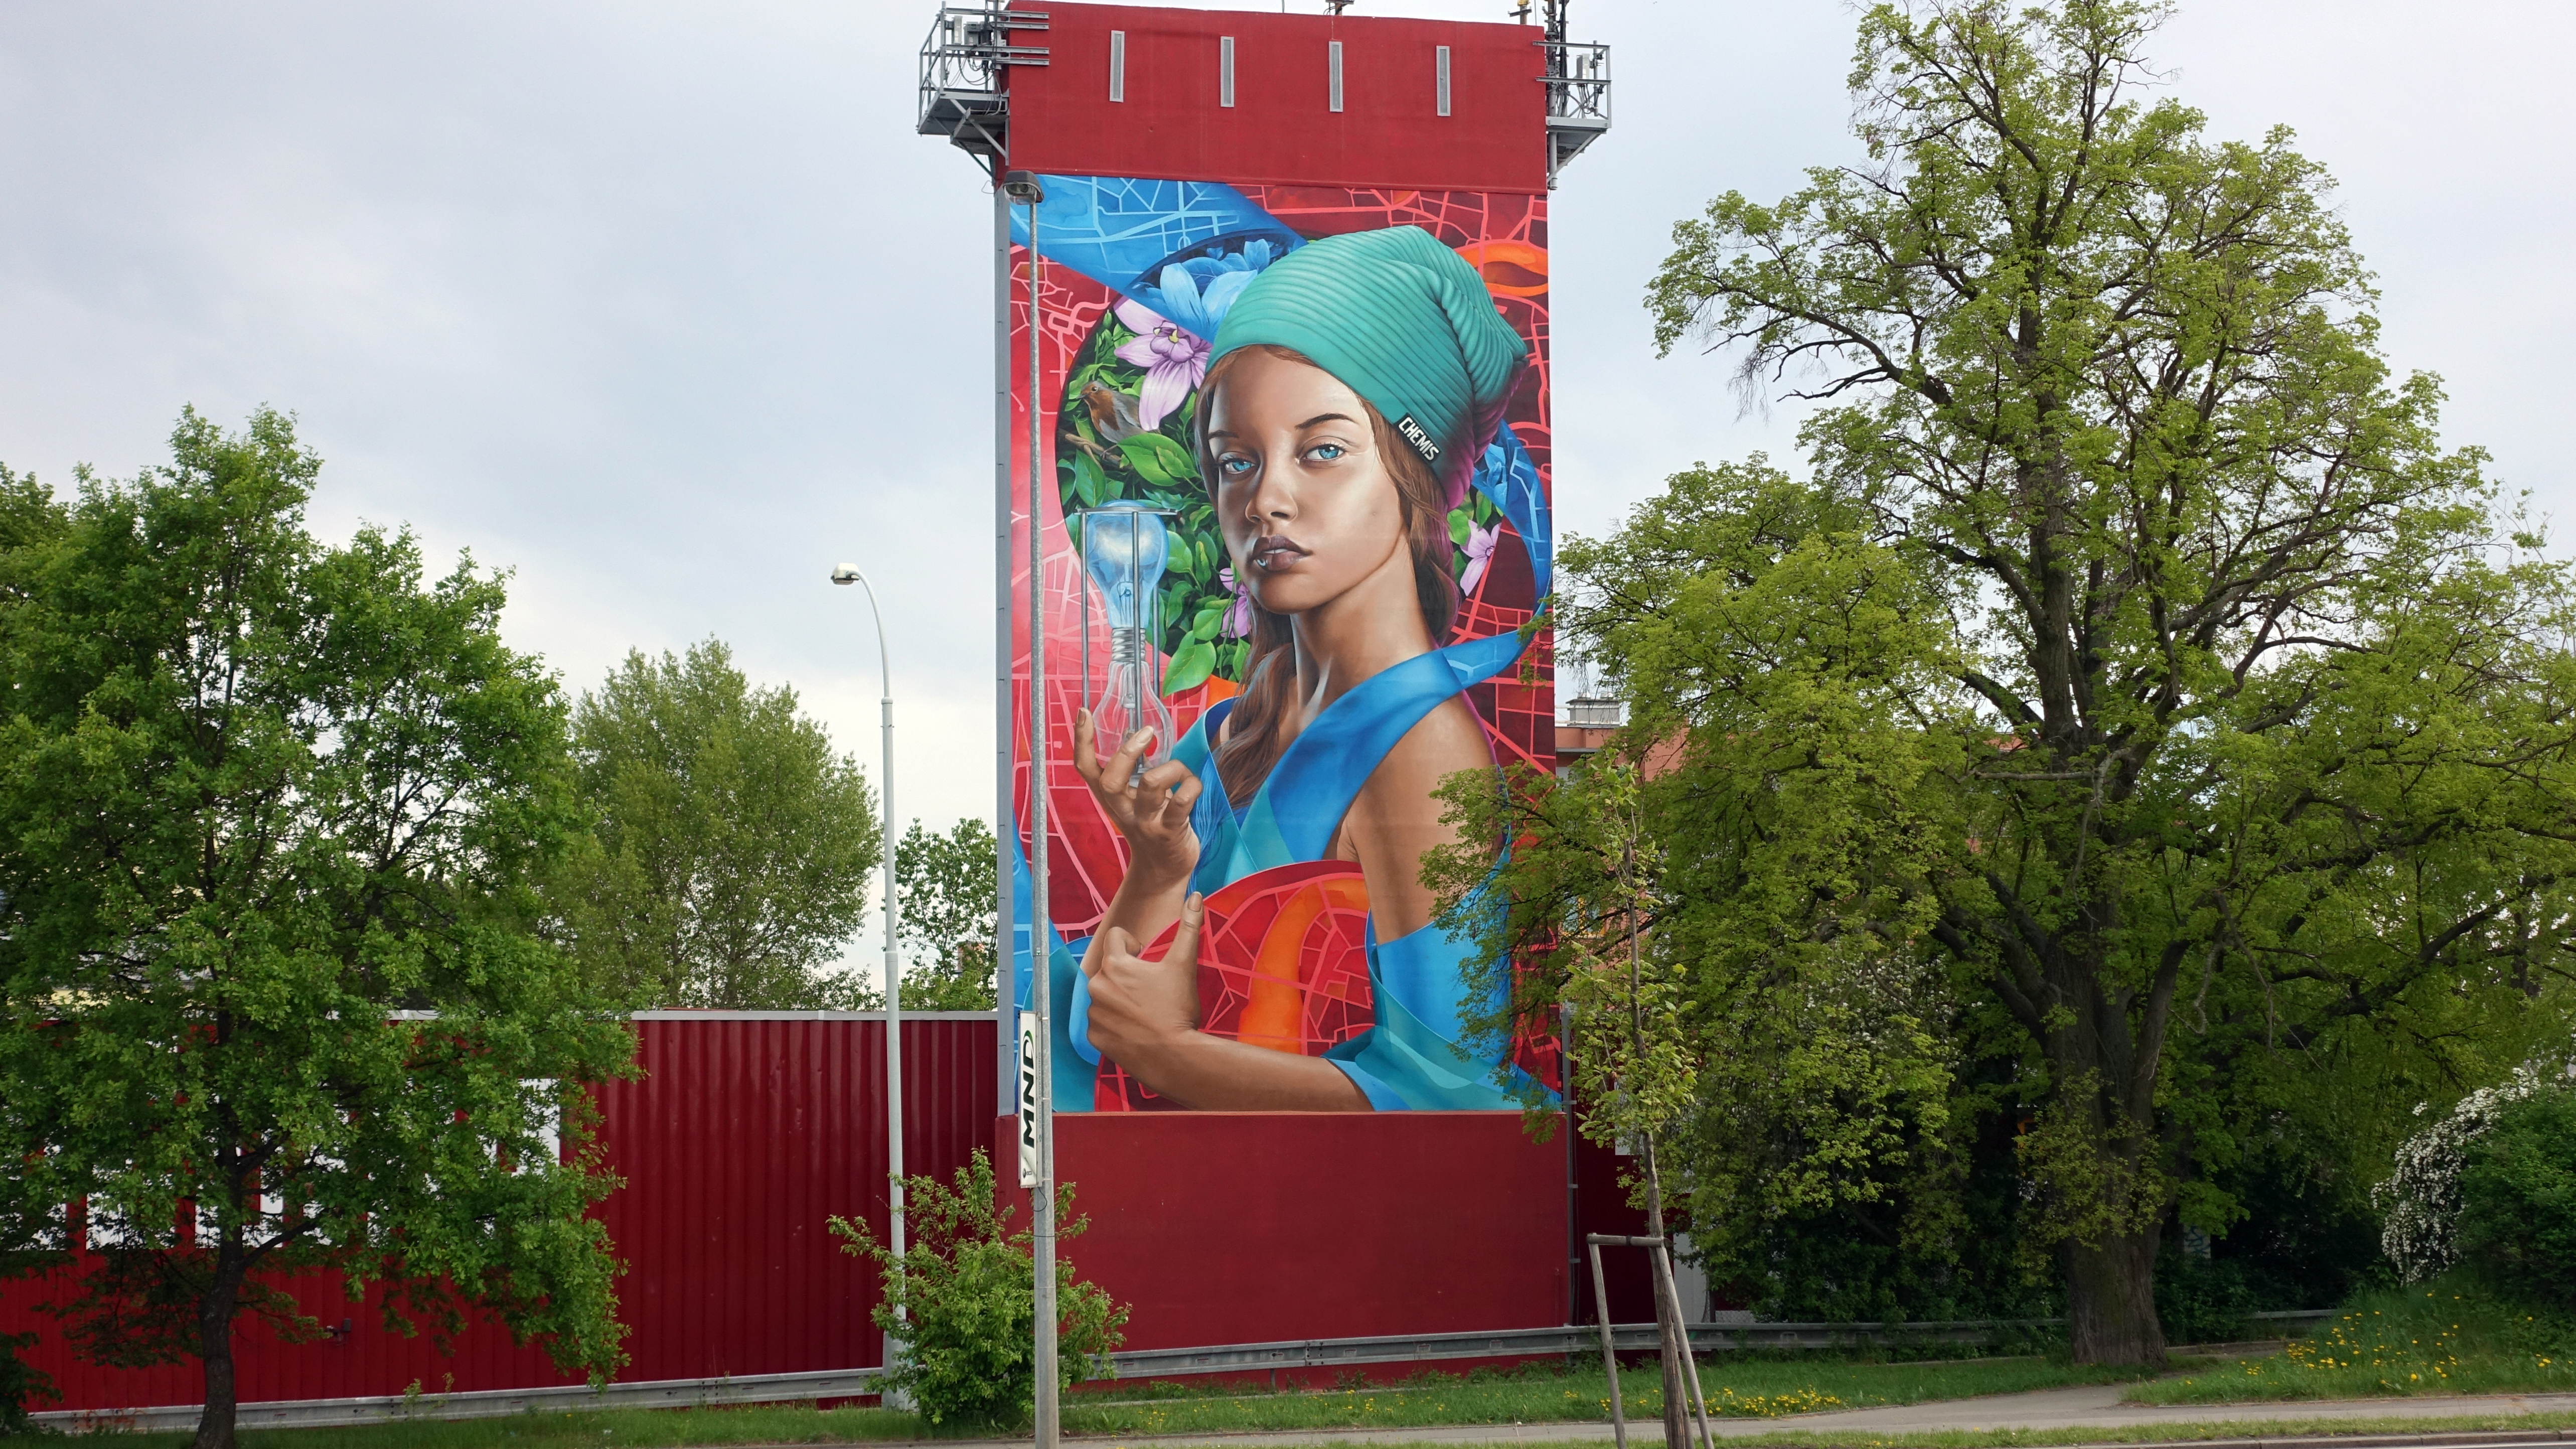 Prague-Savethebees-mural-graffiti-photorealism